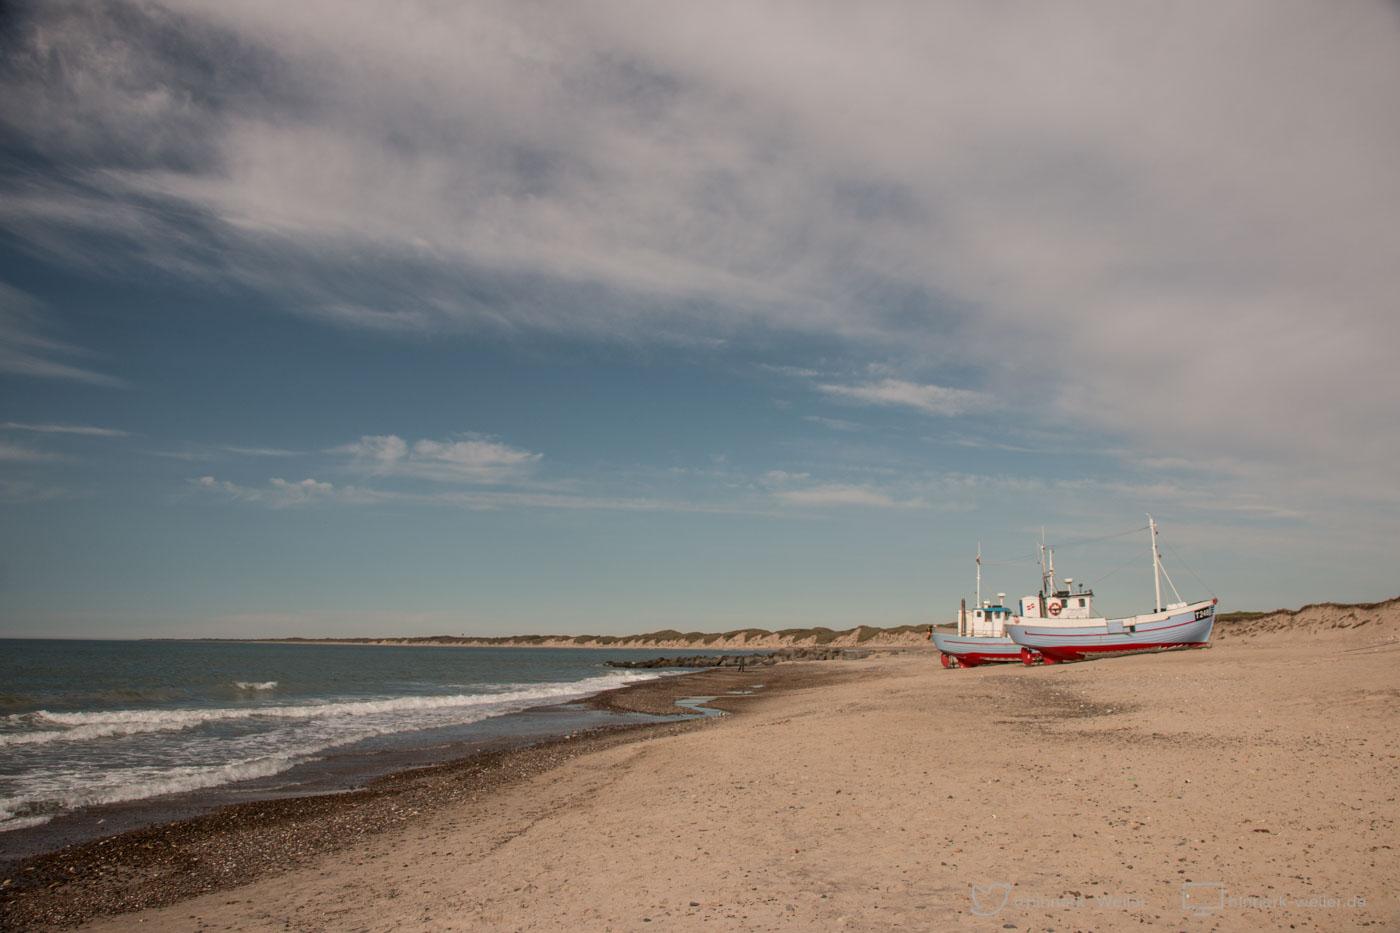 Beach, DK, Danmark, Denmark, Dänemark, Europa, Fishing Vessel, Nordsee, North Sea, Nr.Voropor, Thy, boats, the world